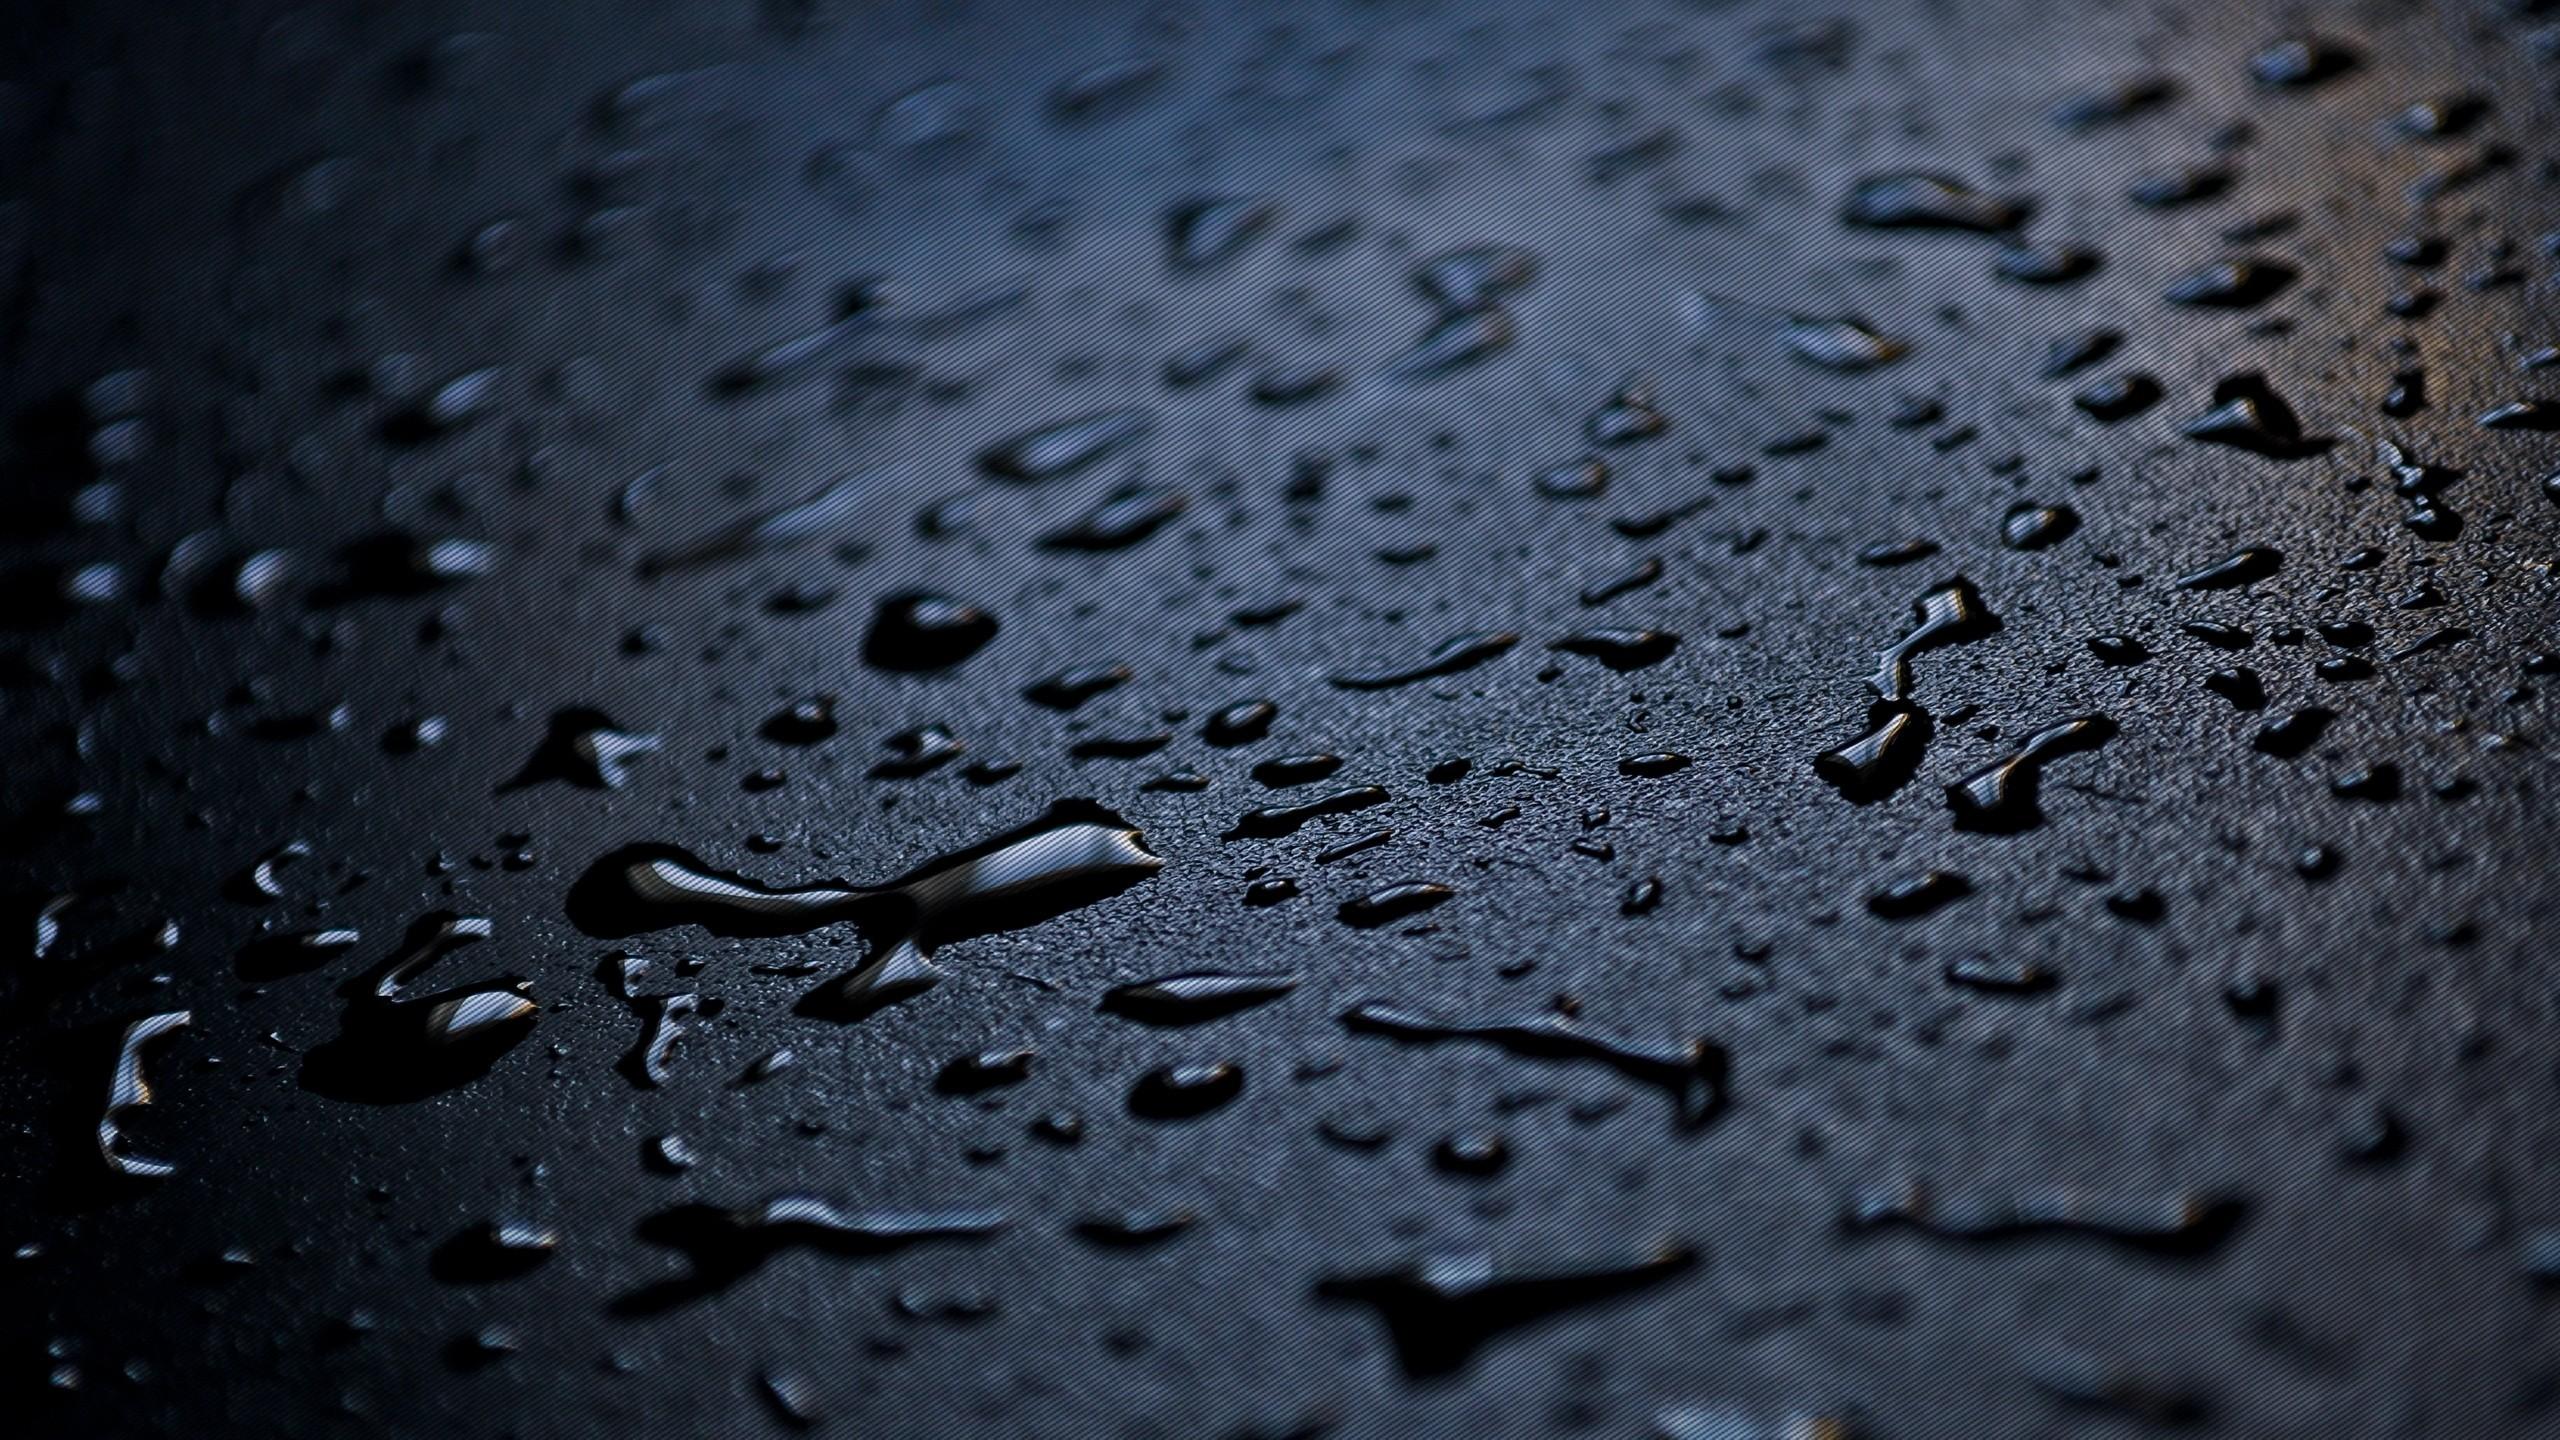 And Rain Drops Wallpaper Download Free Hd Desktop Backgrounds